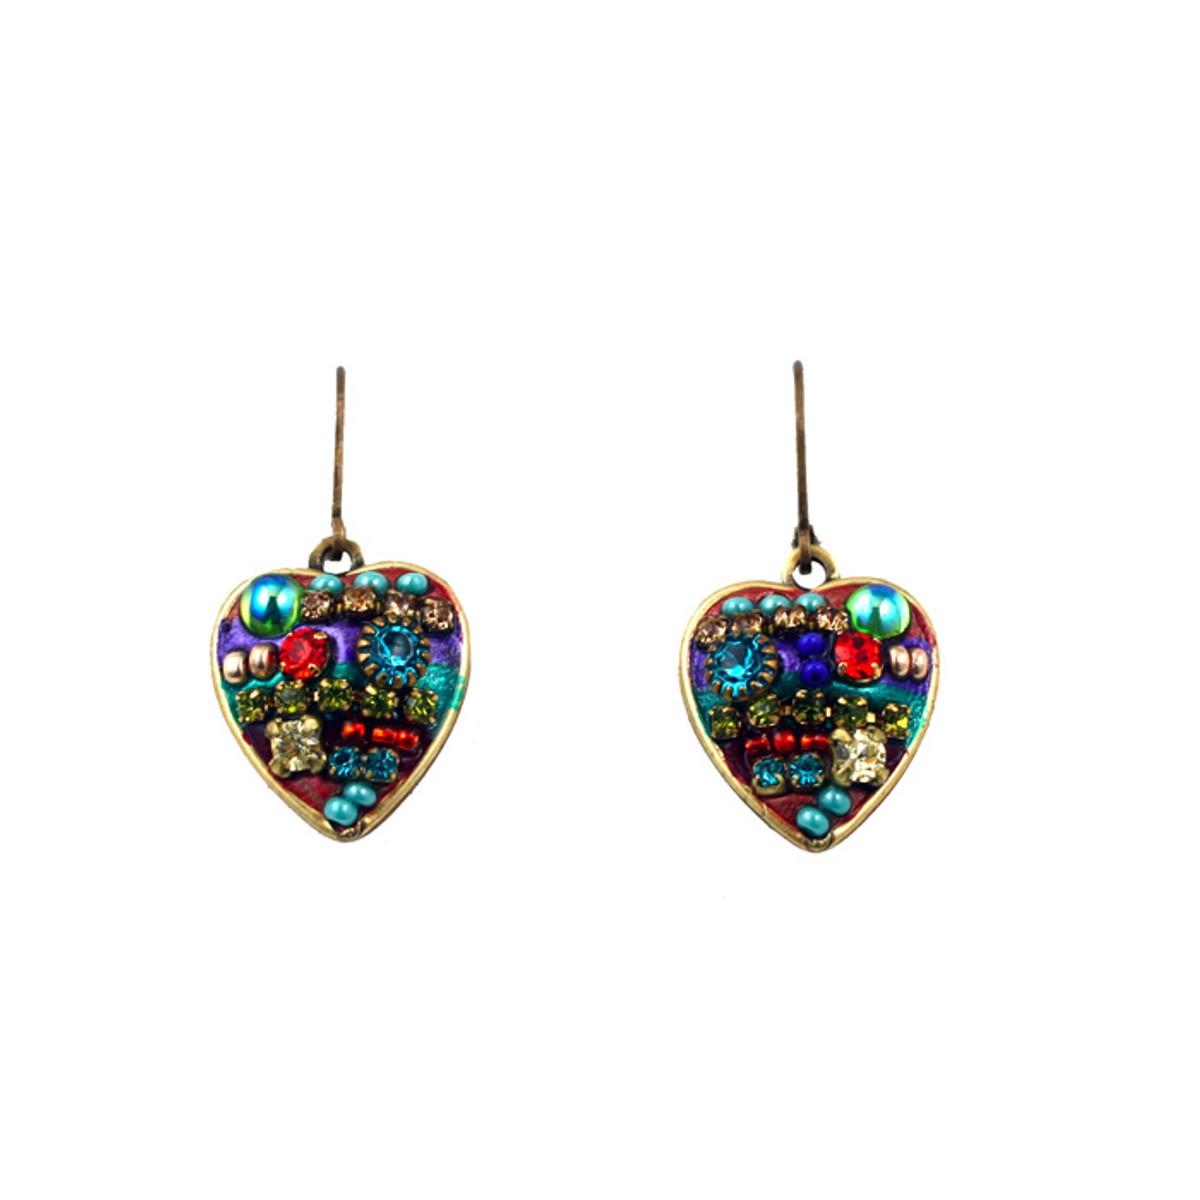 Michal Golan Earrings -Multicolor heart dangle